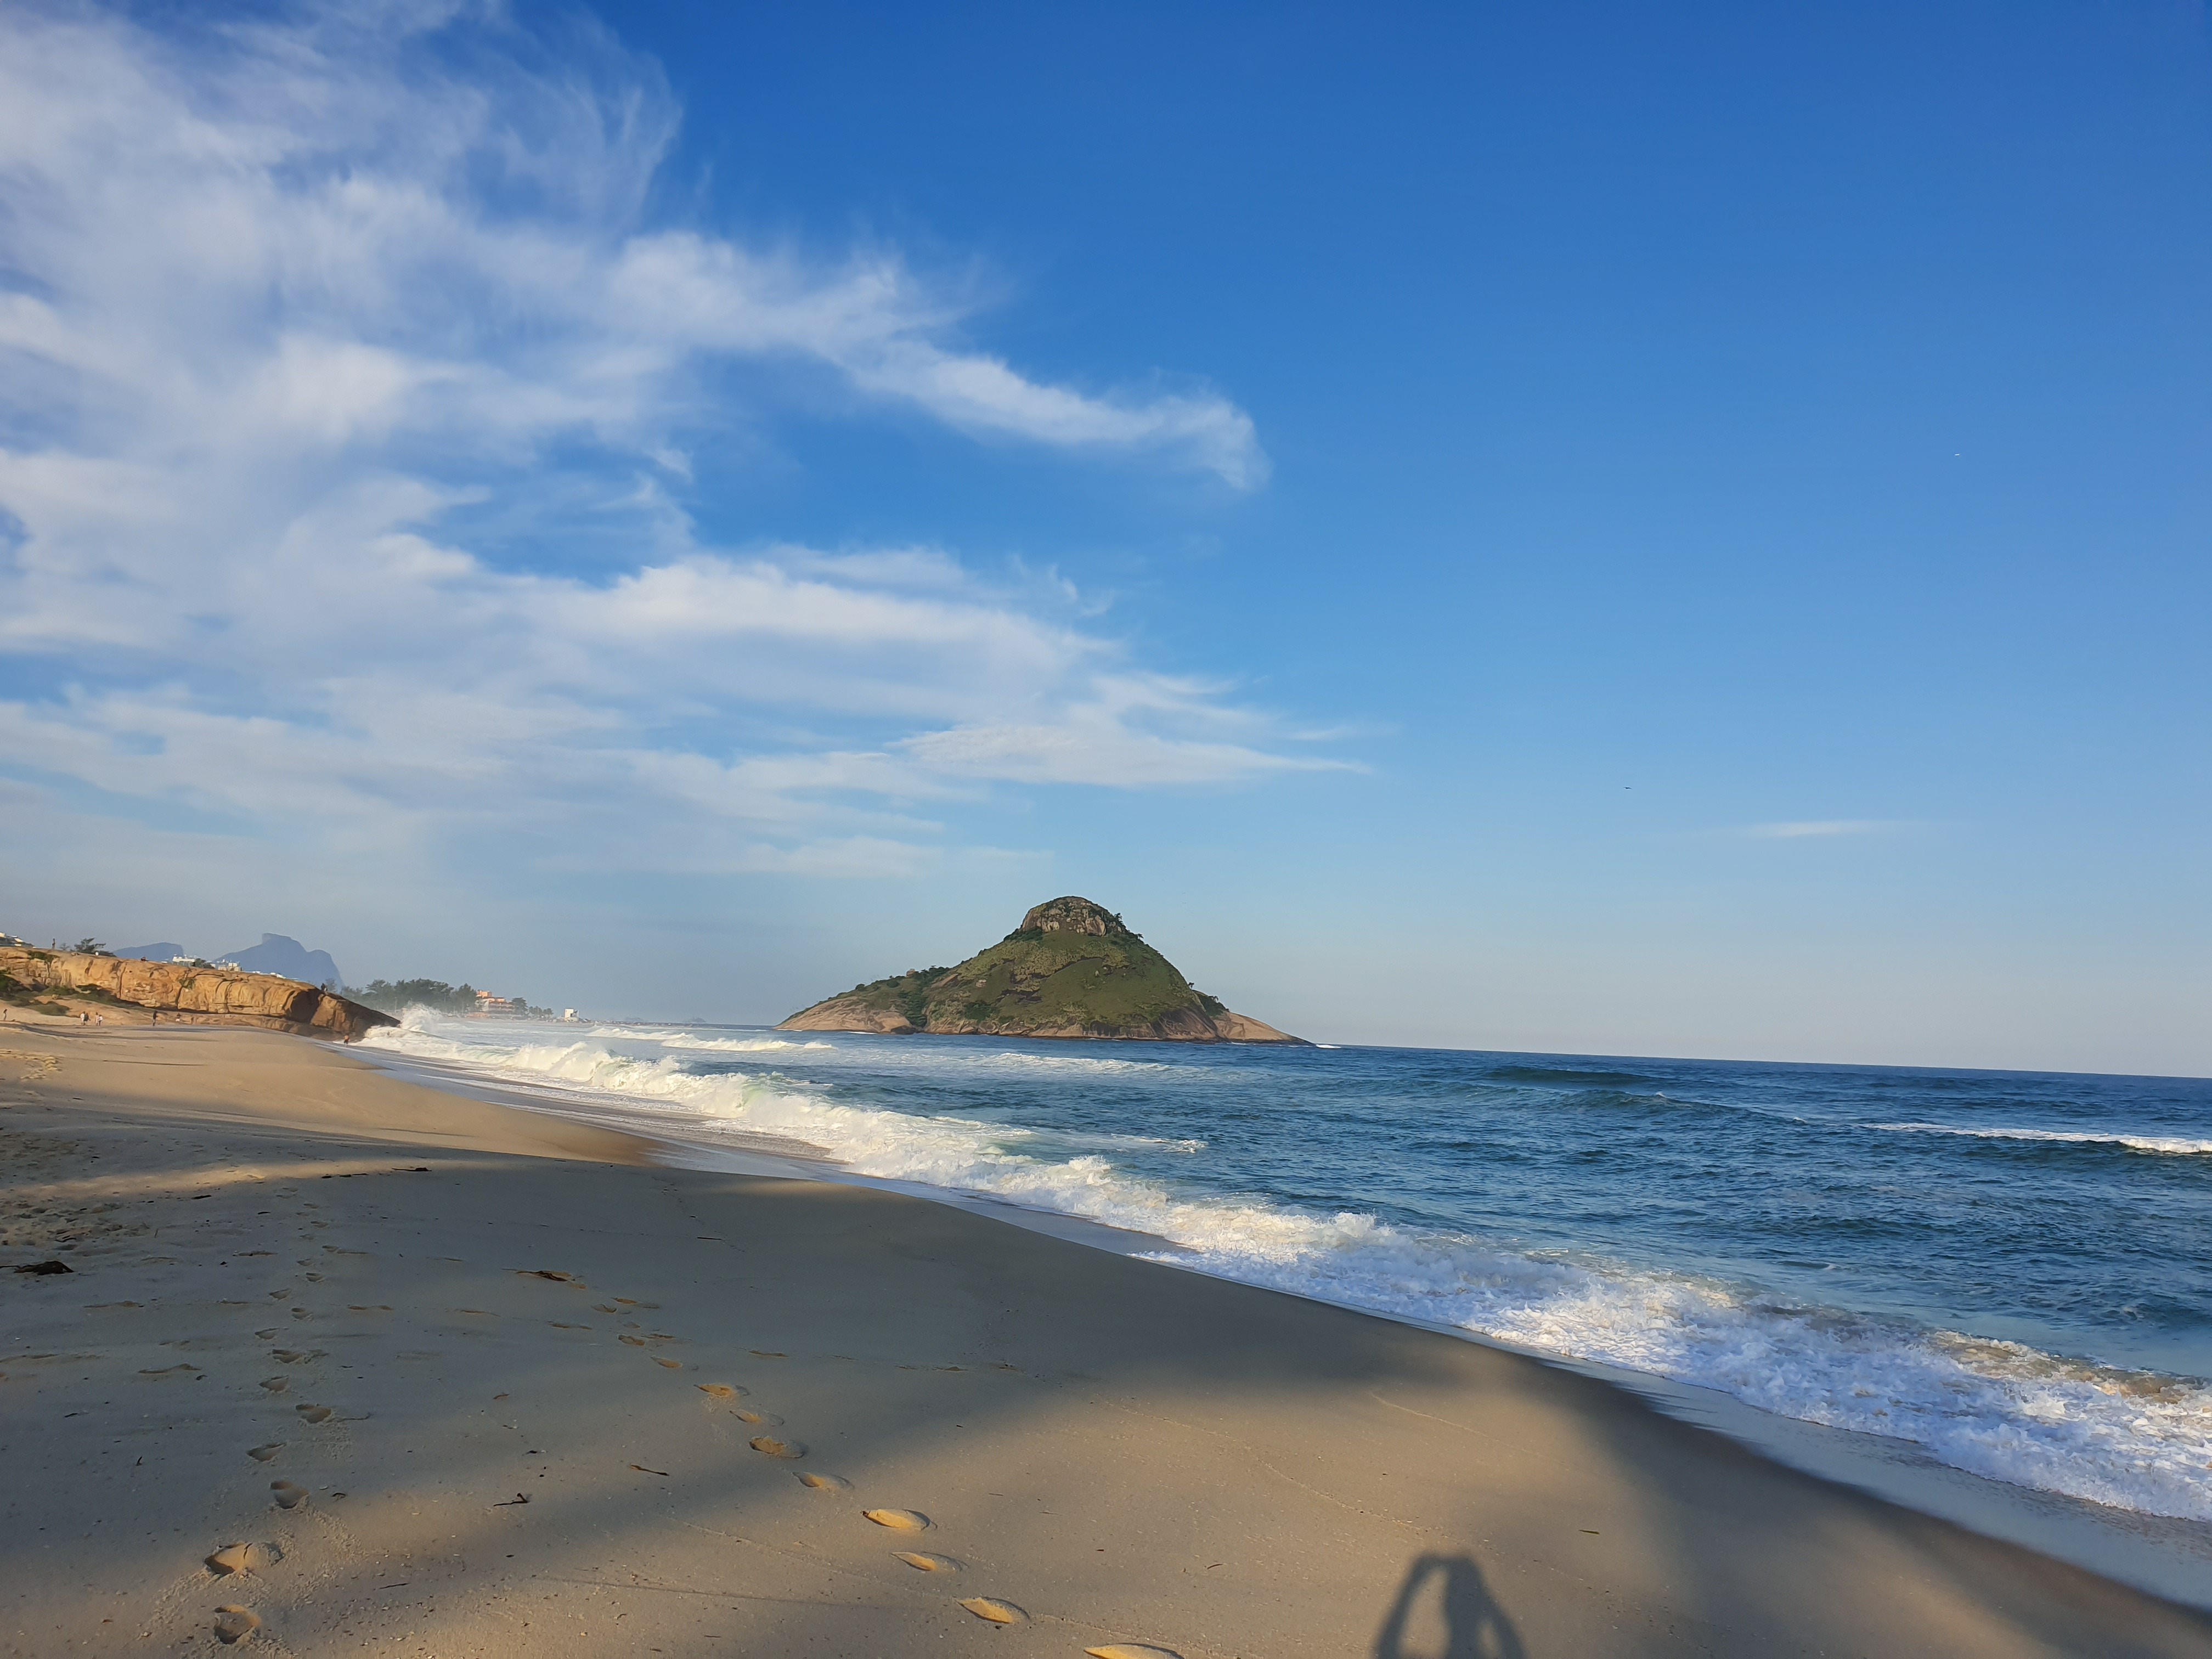 Macumba beach at sunset